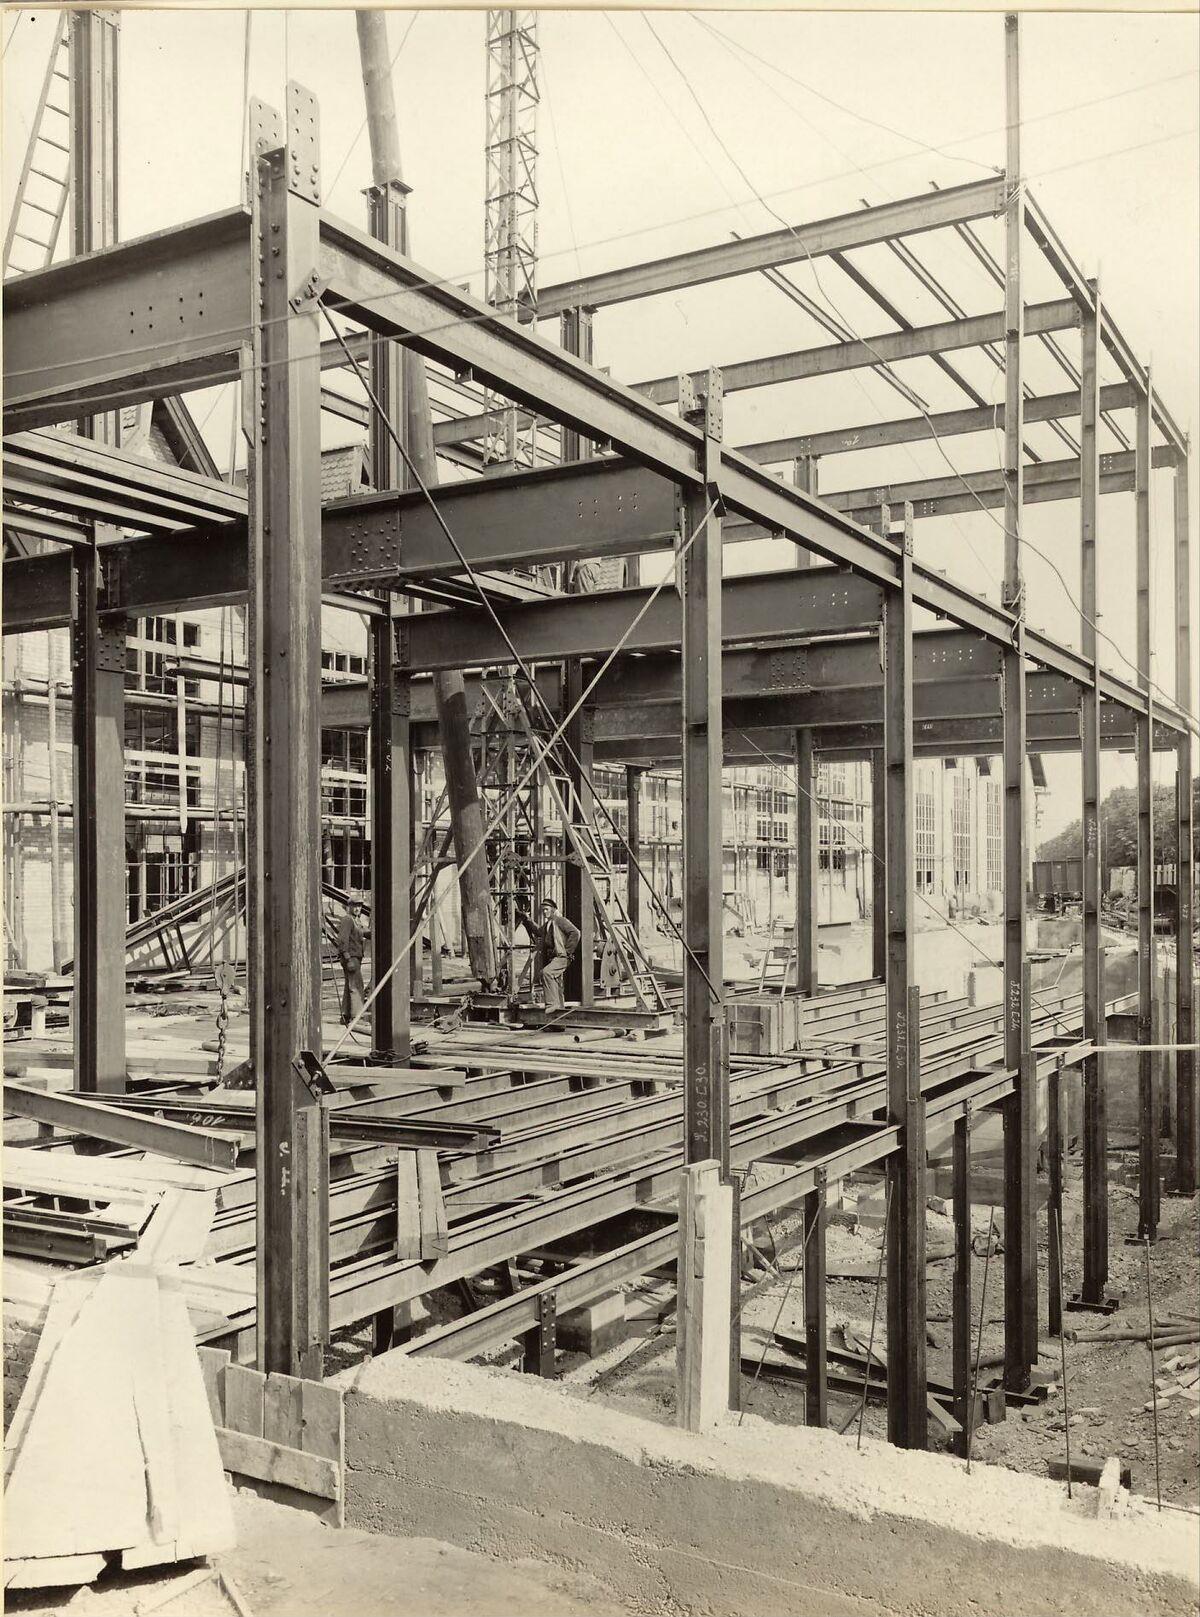 GFA 24/53.1118: Reconstruction sand shop